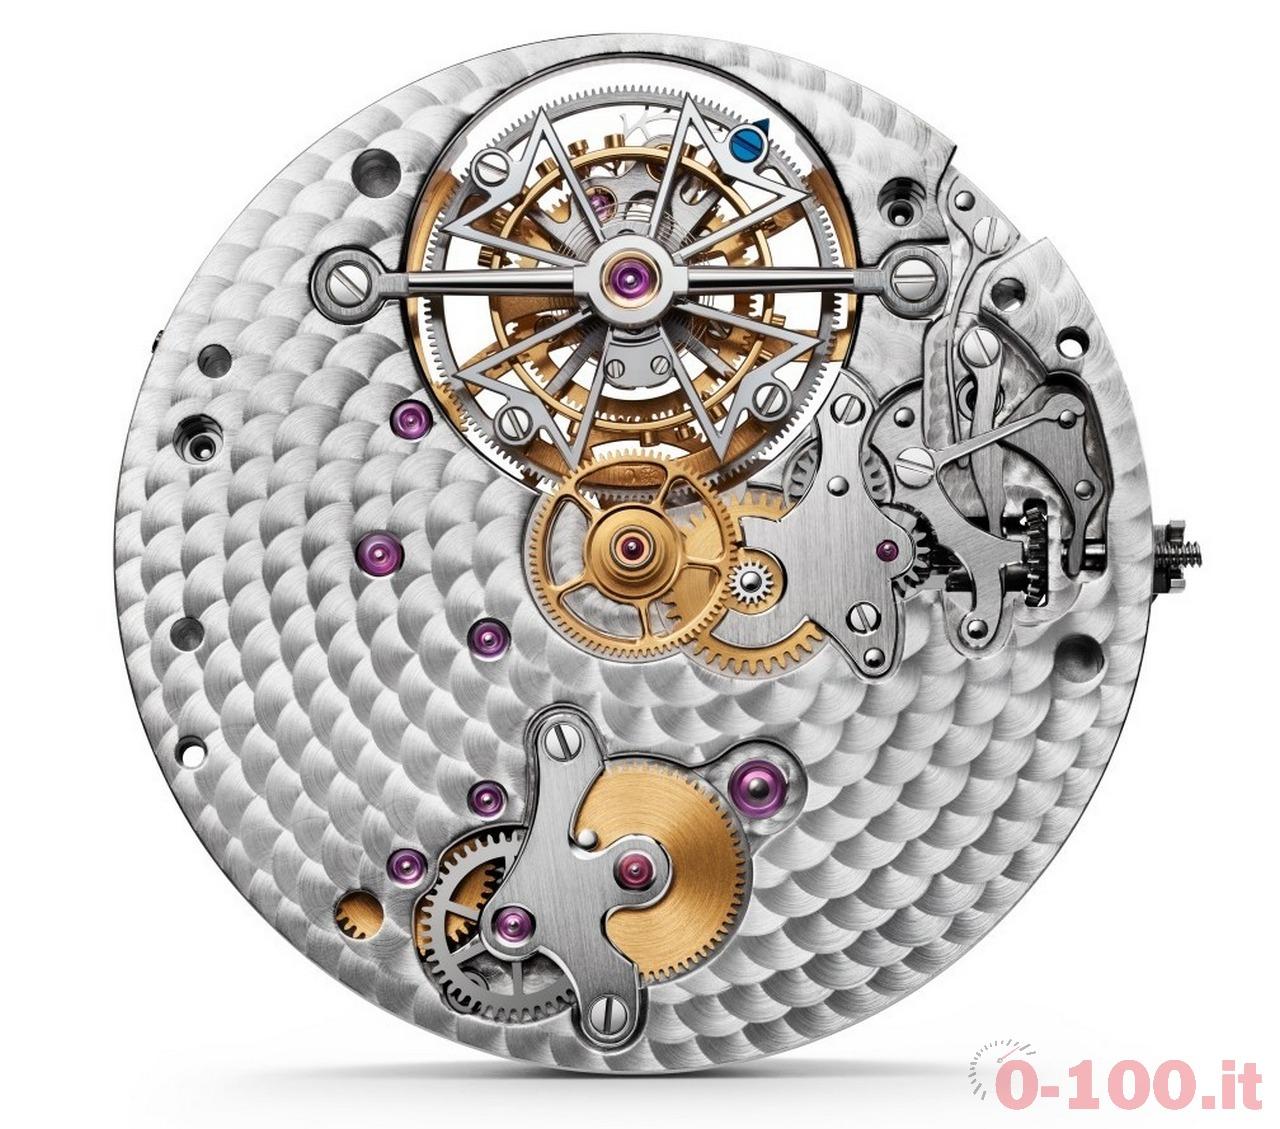 sihh-2015-vacheron-constantin-harmony-cronografo-tourbillon-calibro-3200-ref-5100s000p-b056-limited-edition_0-100_11